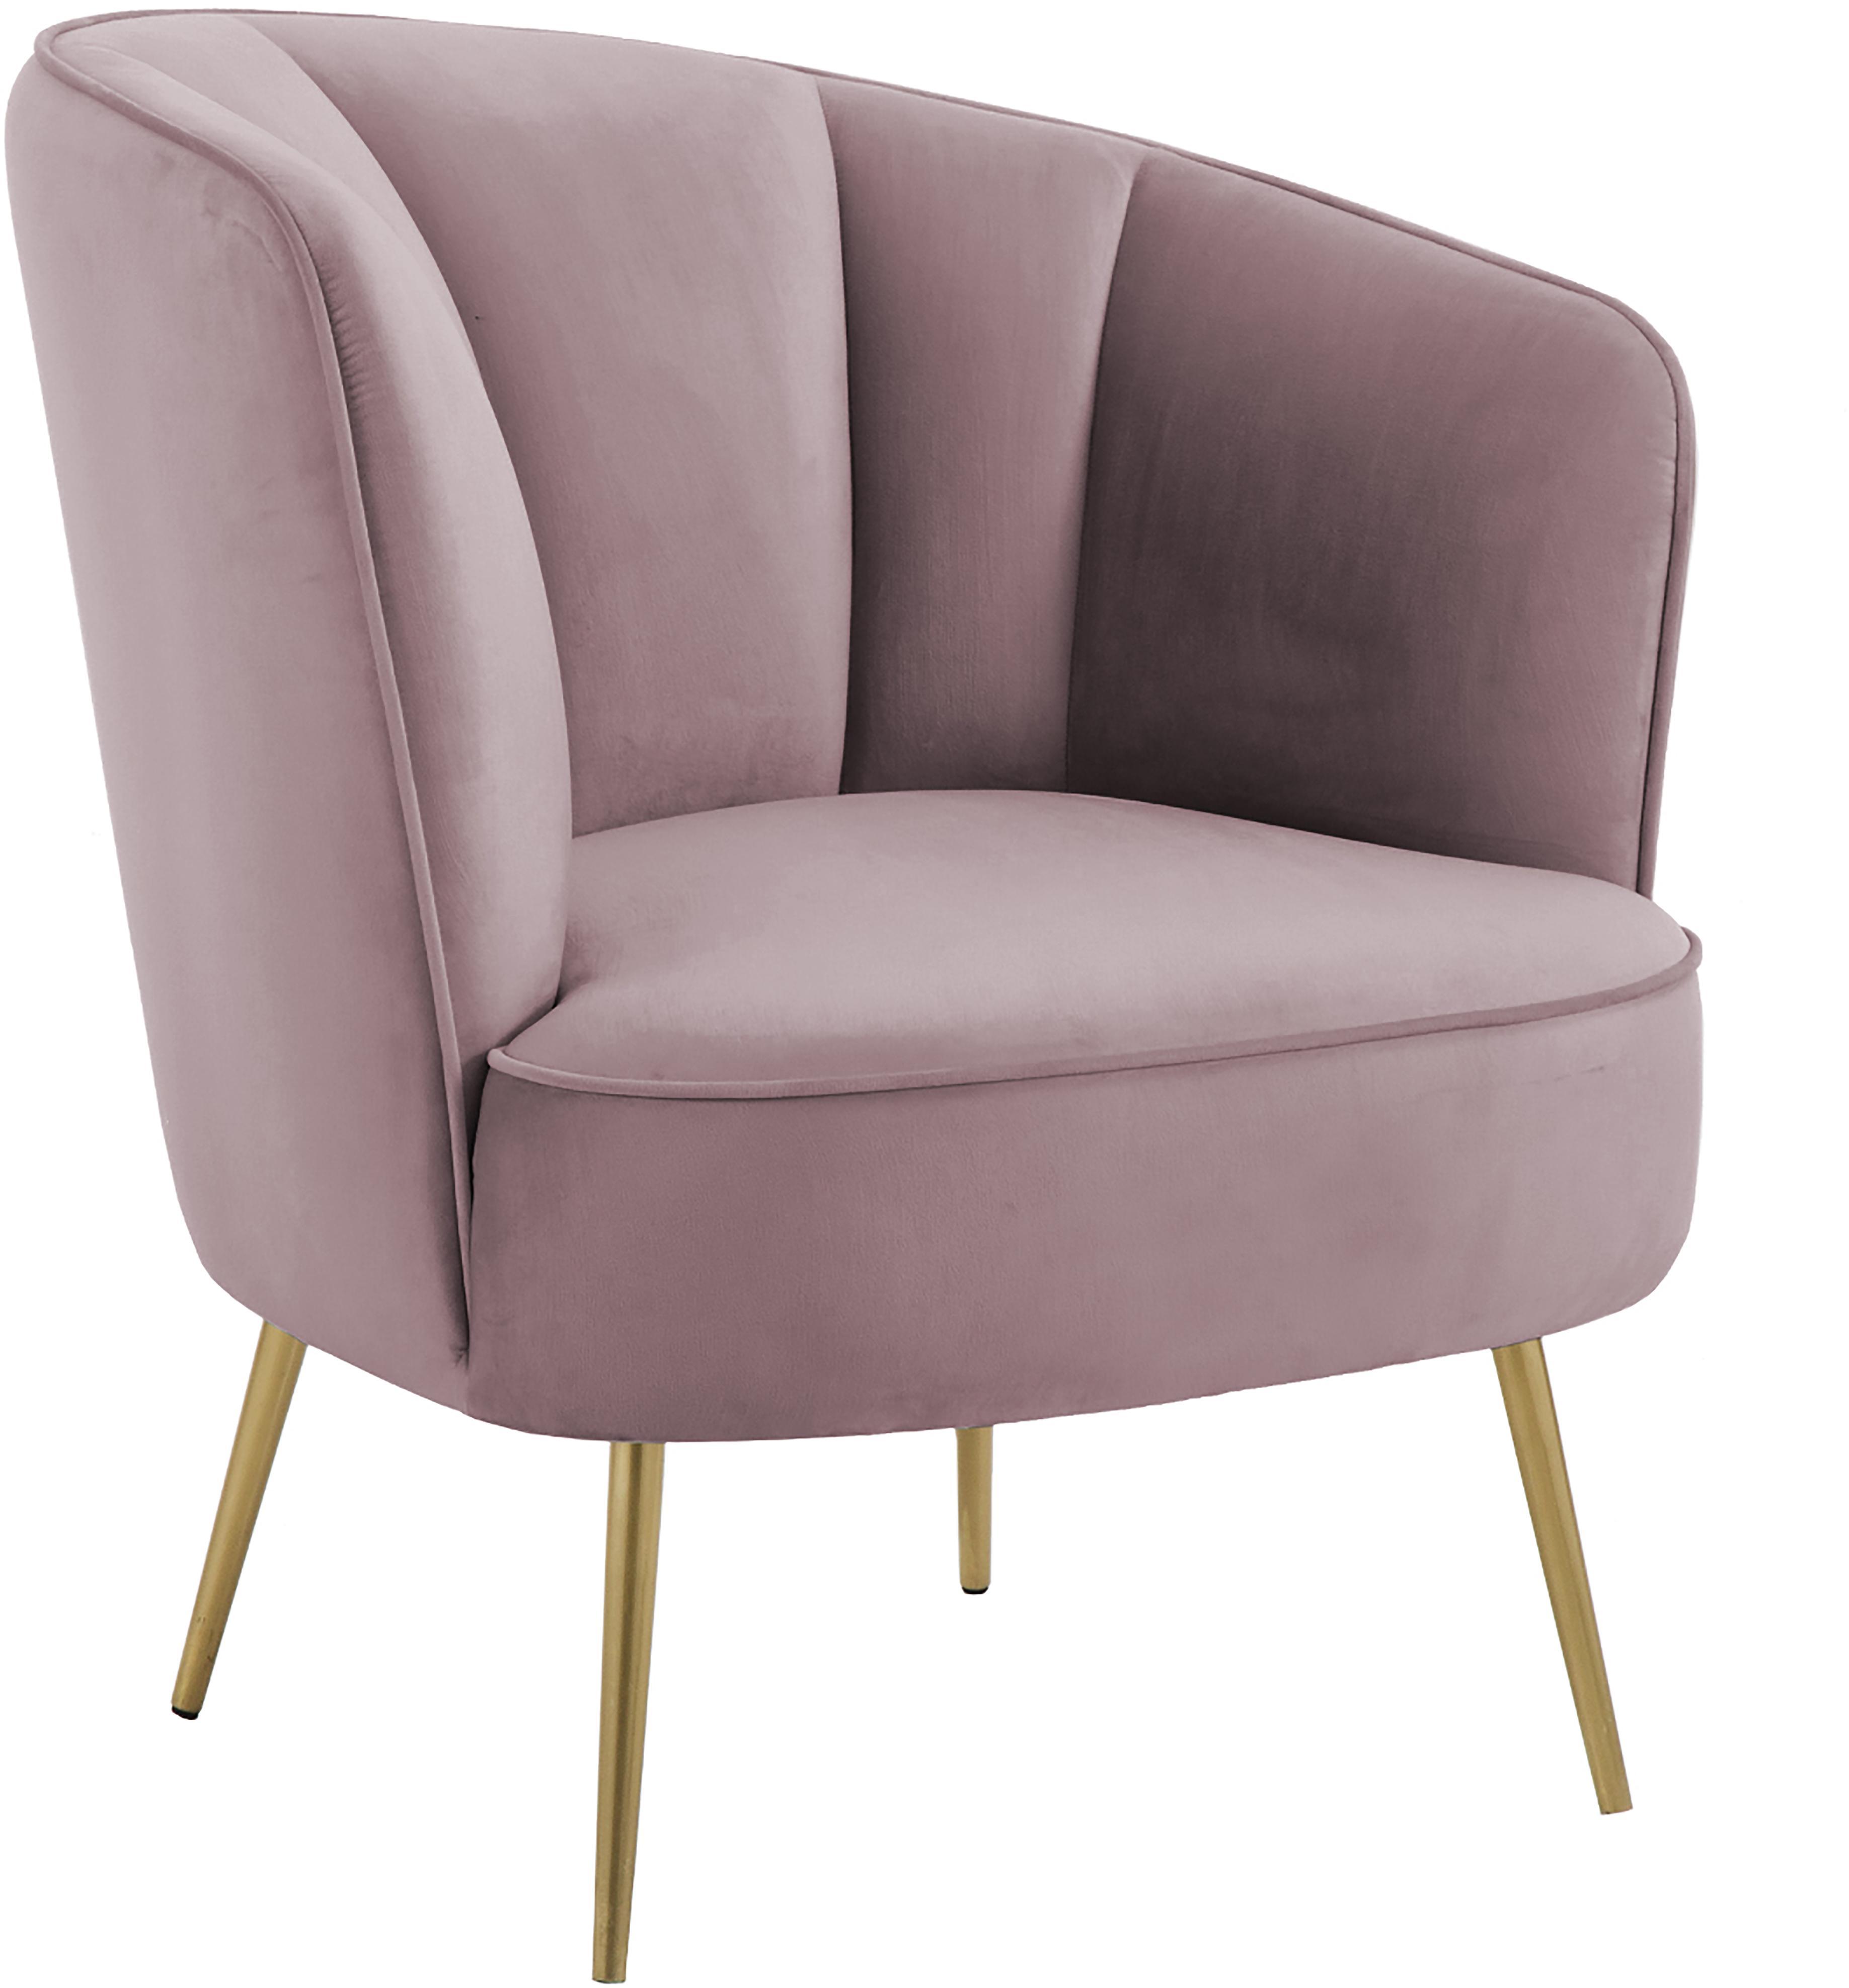 Fluwelen fauteuil Louise, Bekleding: fluweel (polyester), Poten: gecoat metaal, Roze, B 76 x D 74 cm